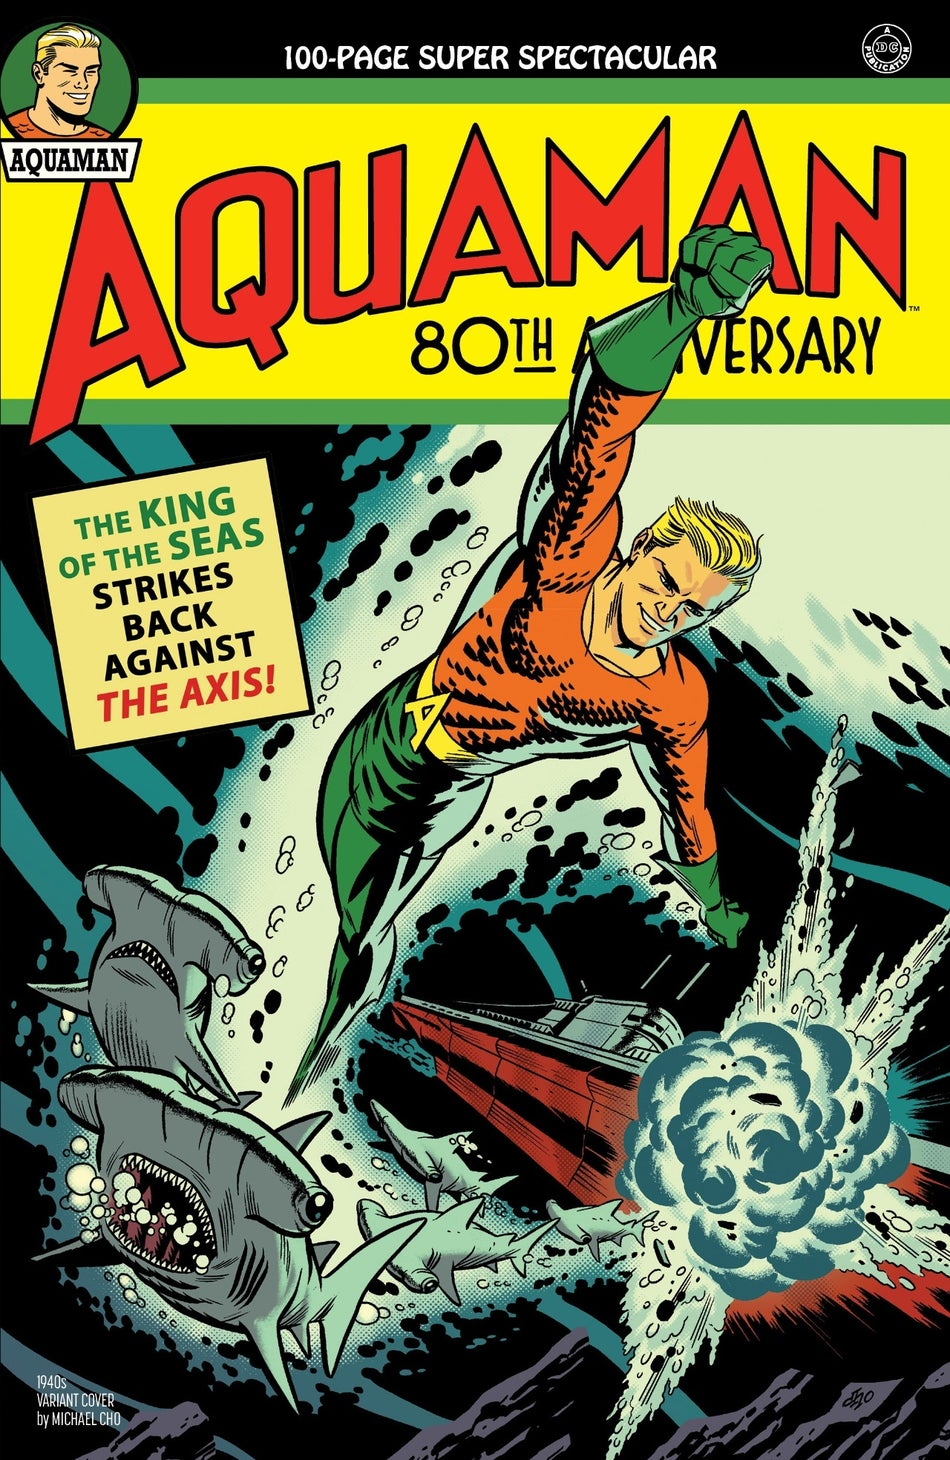 aquaman 80th anniversary cover 1940s